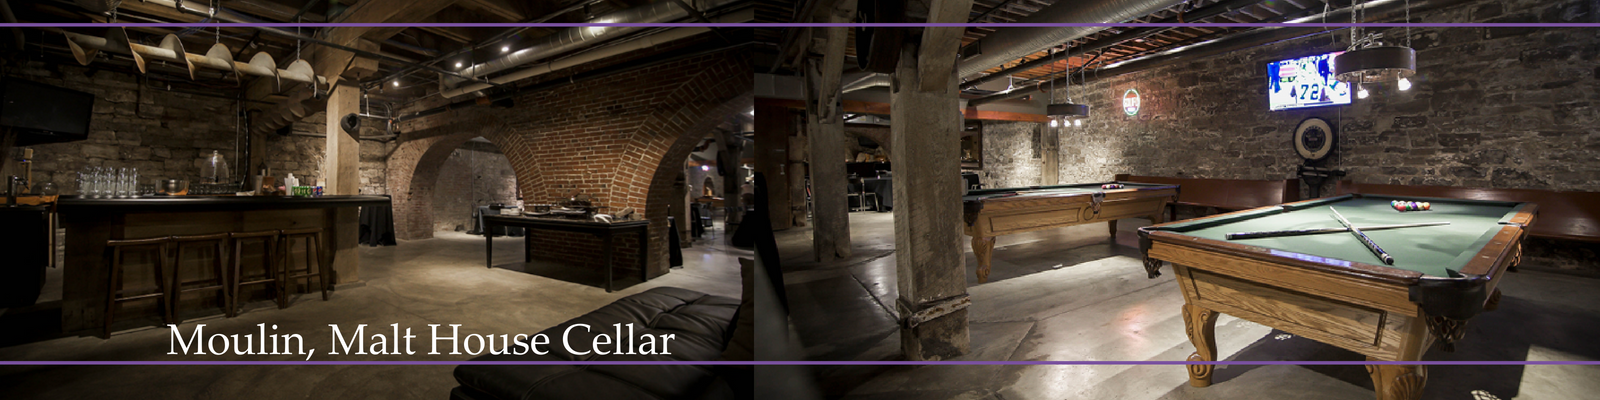 Moulin, Malt House Cellar.png